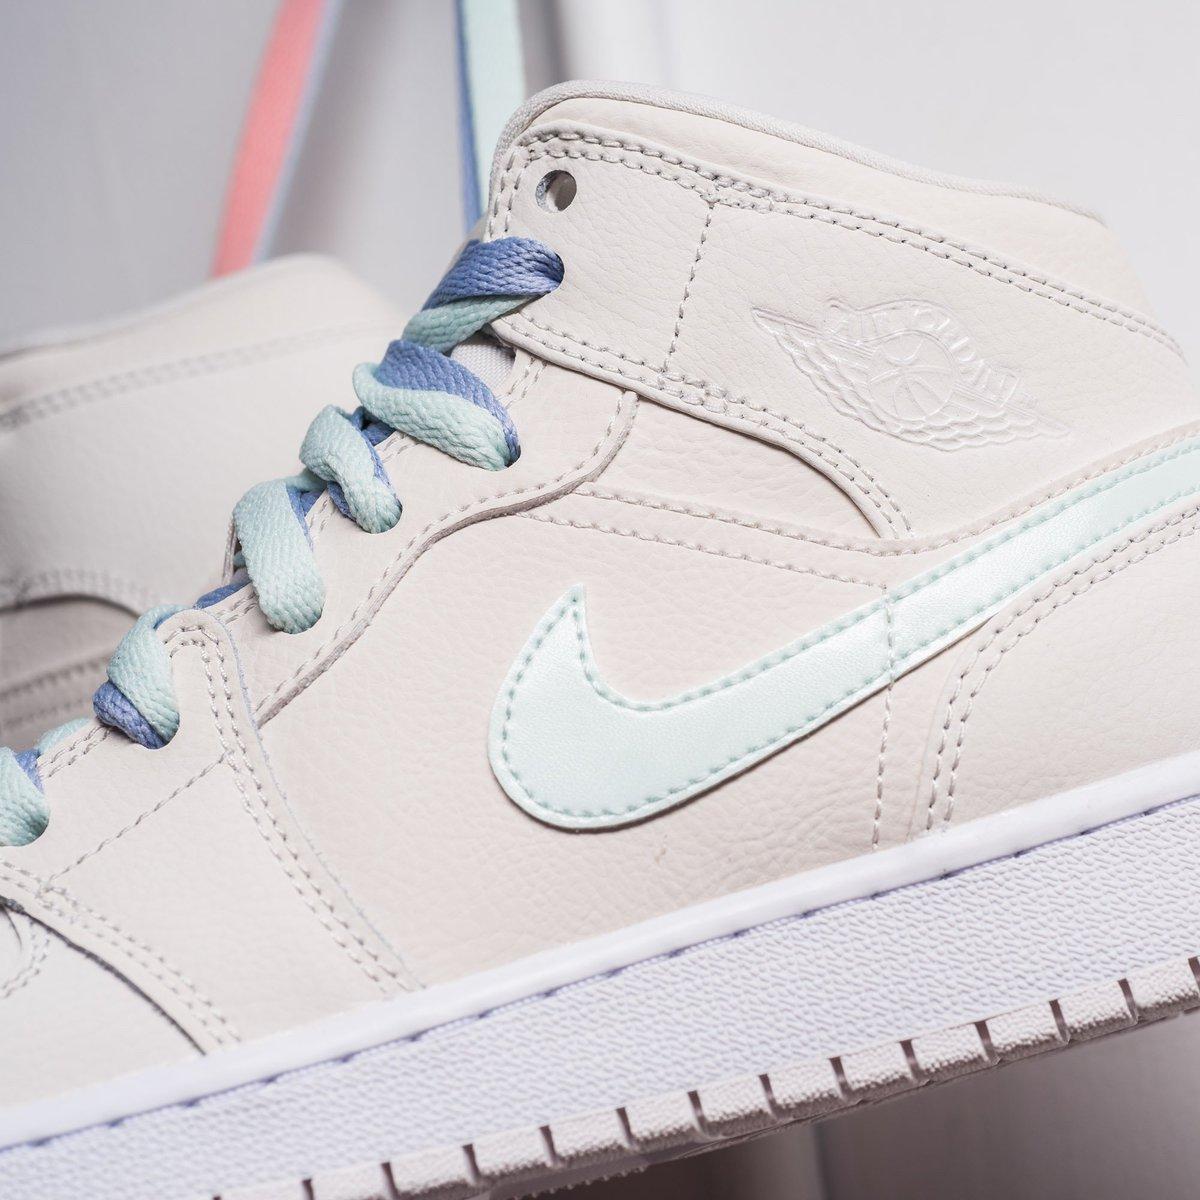 b1fdba4a4923 ... where can i buy sneaker politics on twitter now available air jordan 1  mid gg phantom